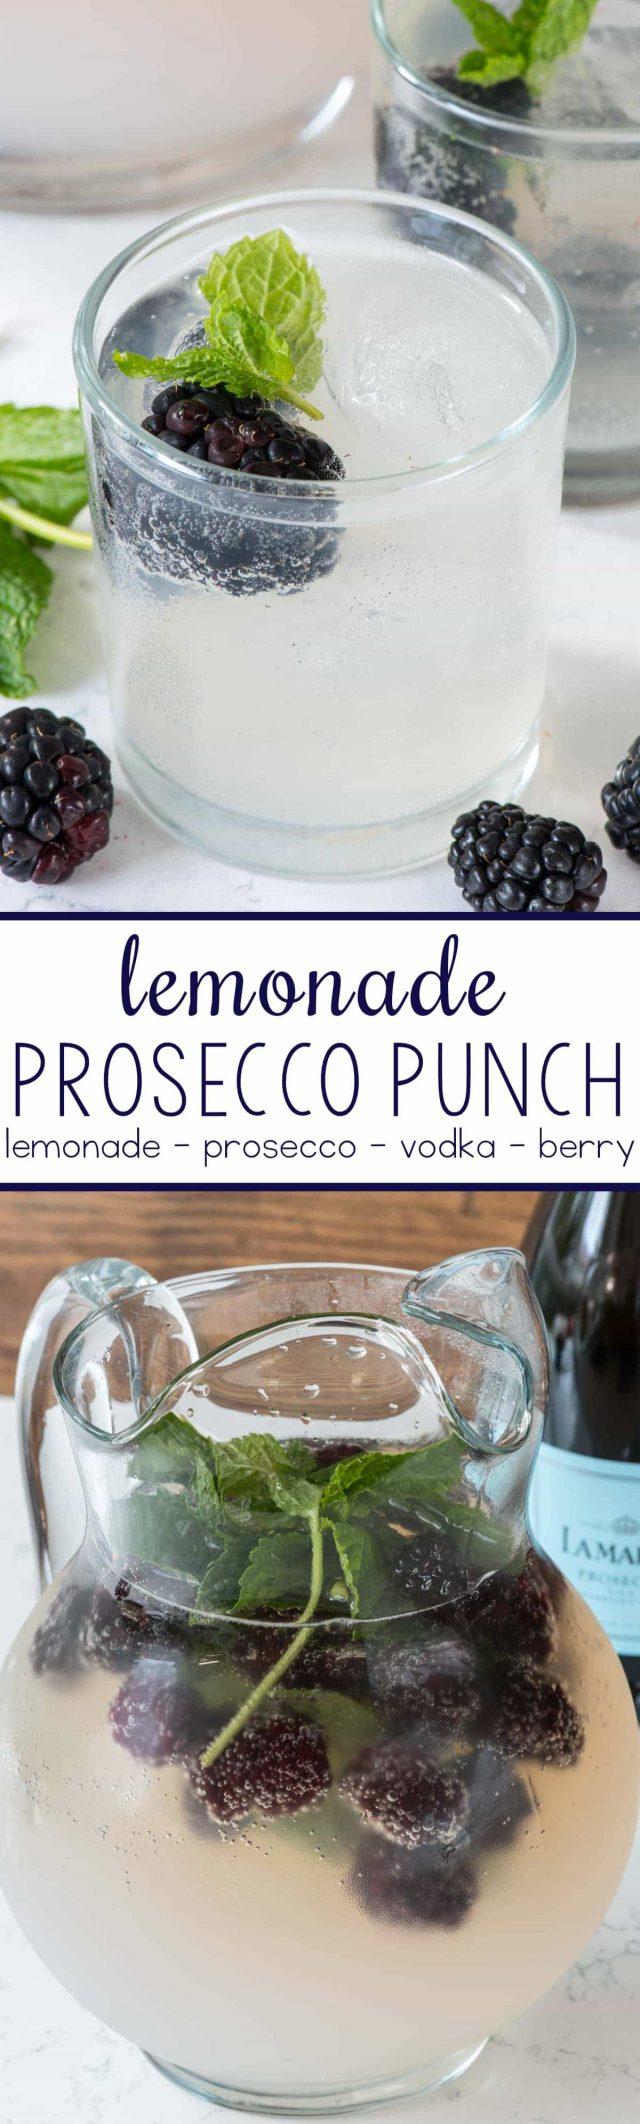 Lemonade Prosecco Punch